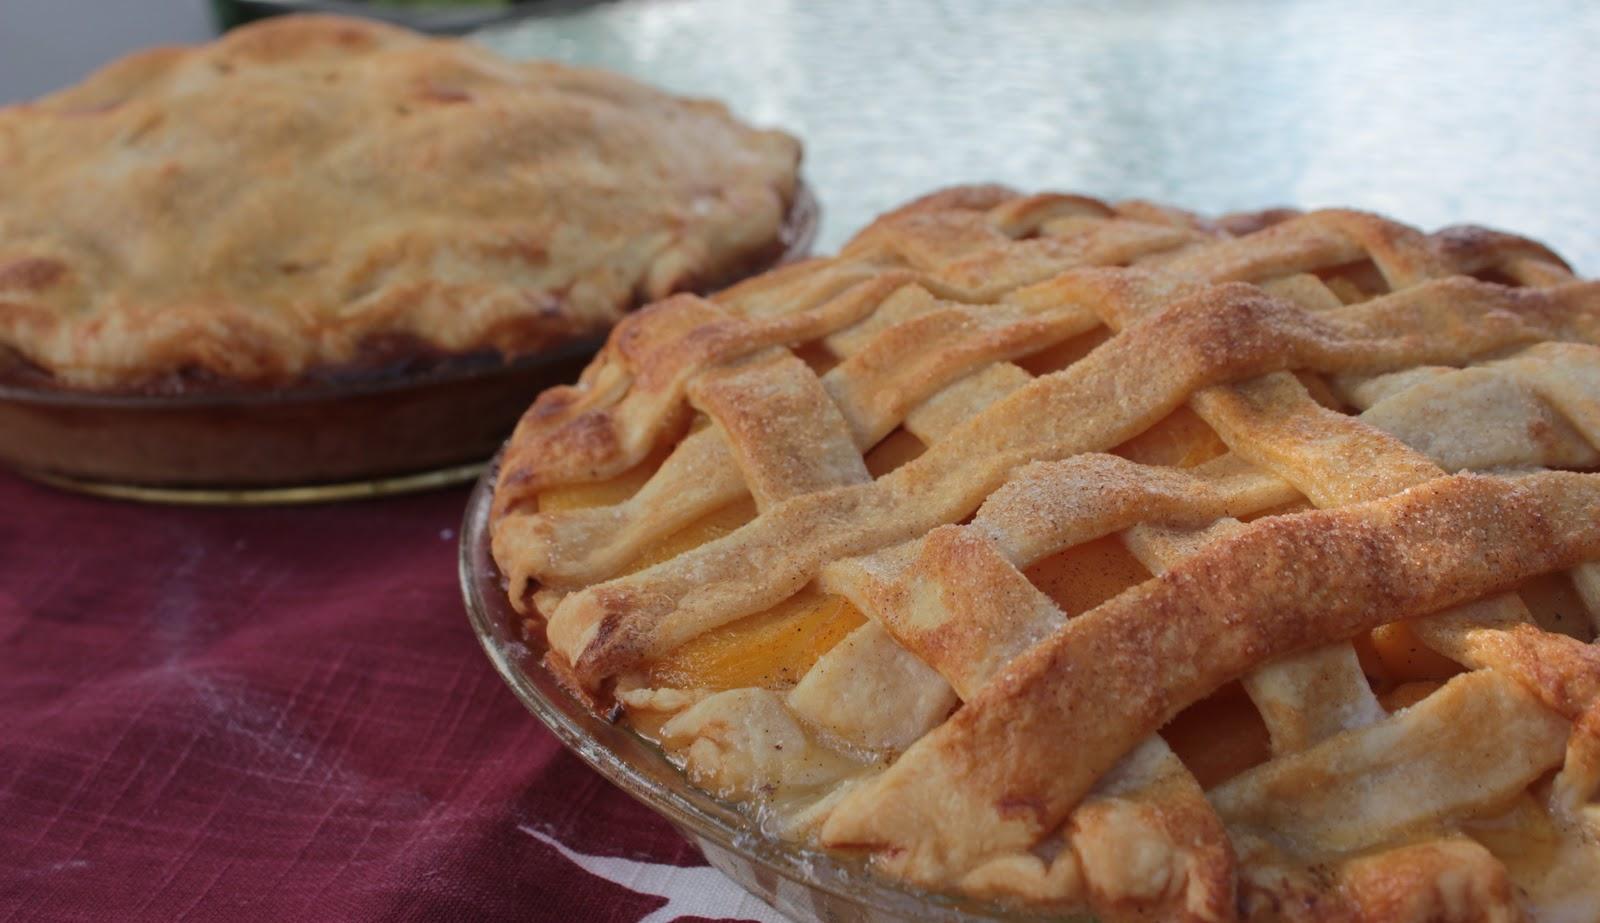 Summer Peach Pie With Vanilla And Cardamom Recipes — Dishmaps